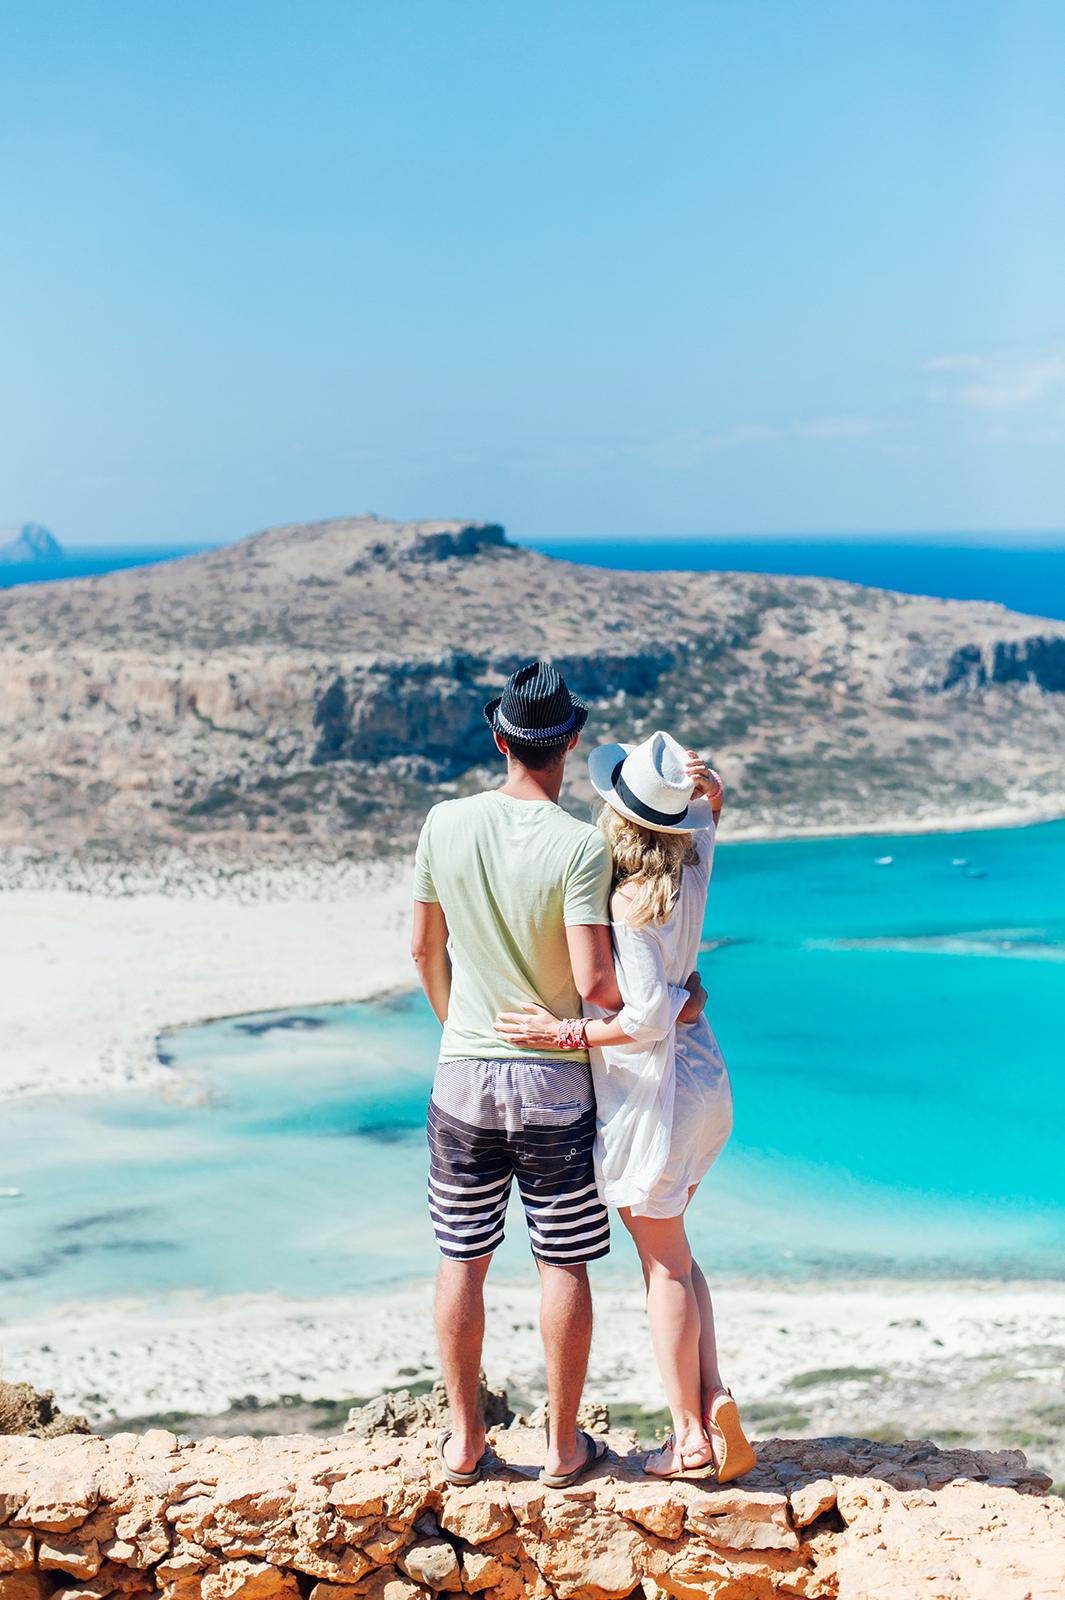 margarita_maslova_ritalifestyle_balos_lagoon_greece_travel_blog_crete